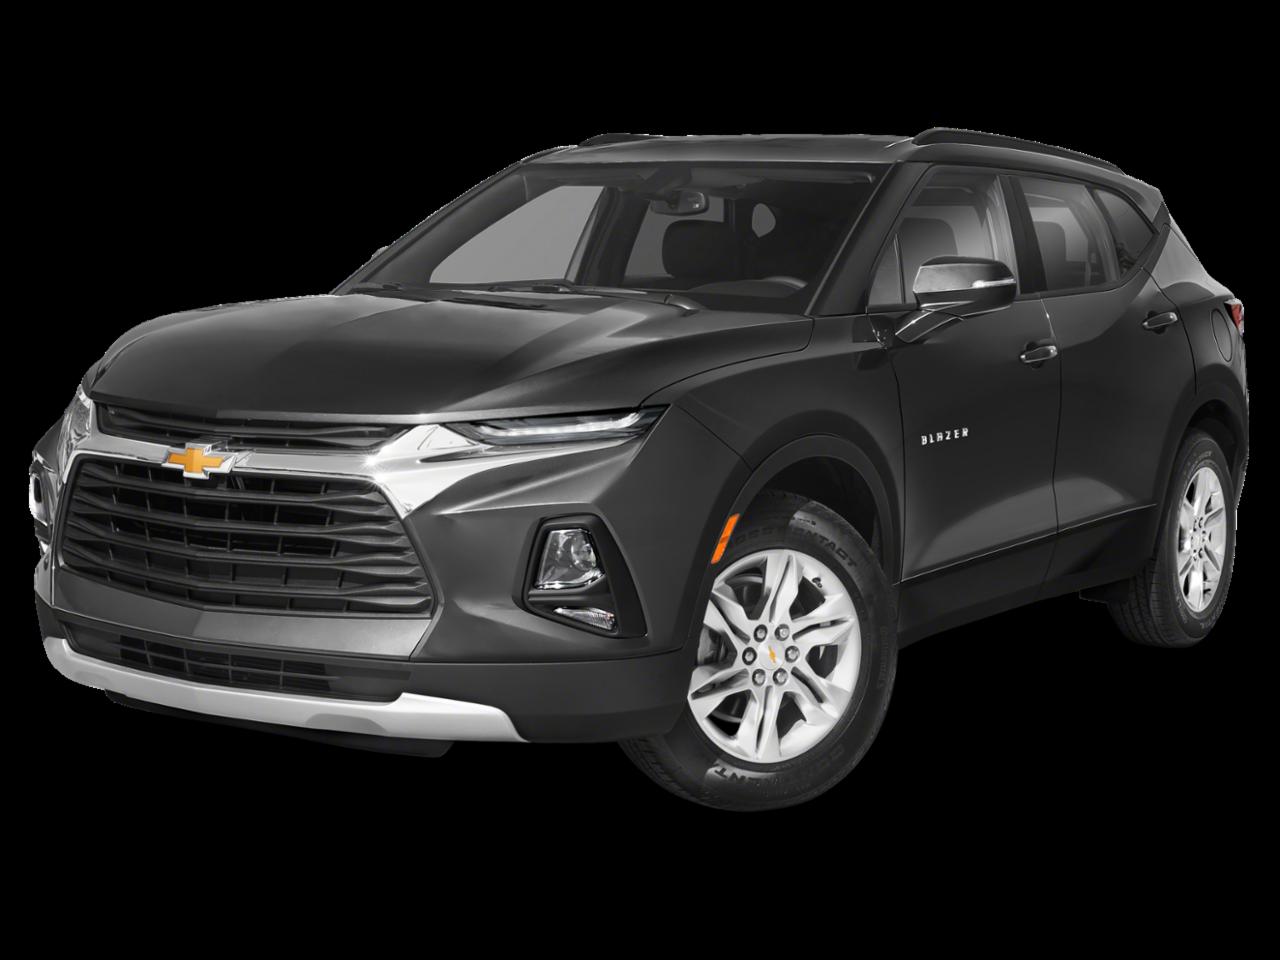 Key Chevrolet Of White River Hartford And Lebanon Nh Dealership